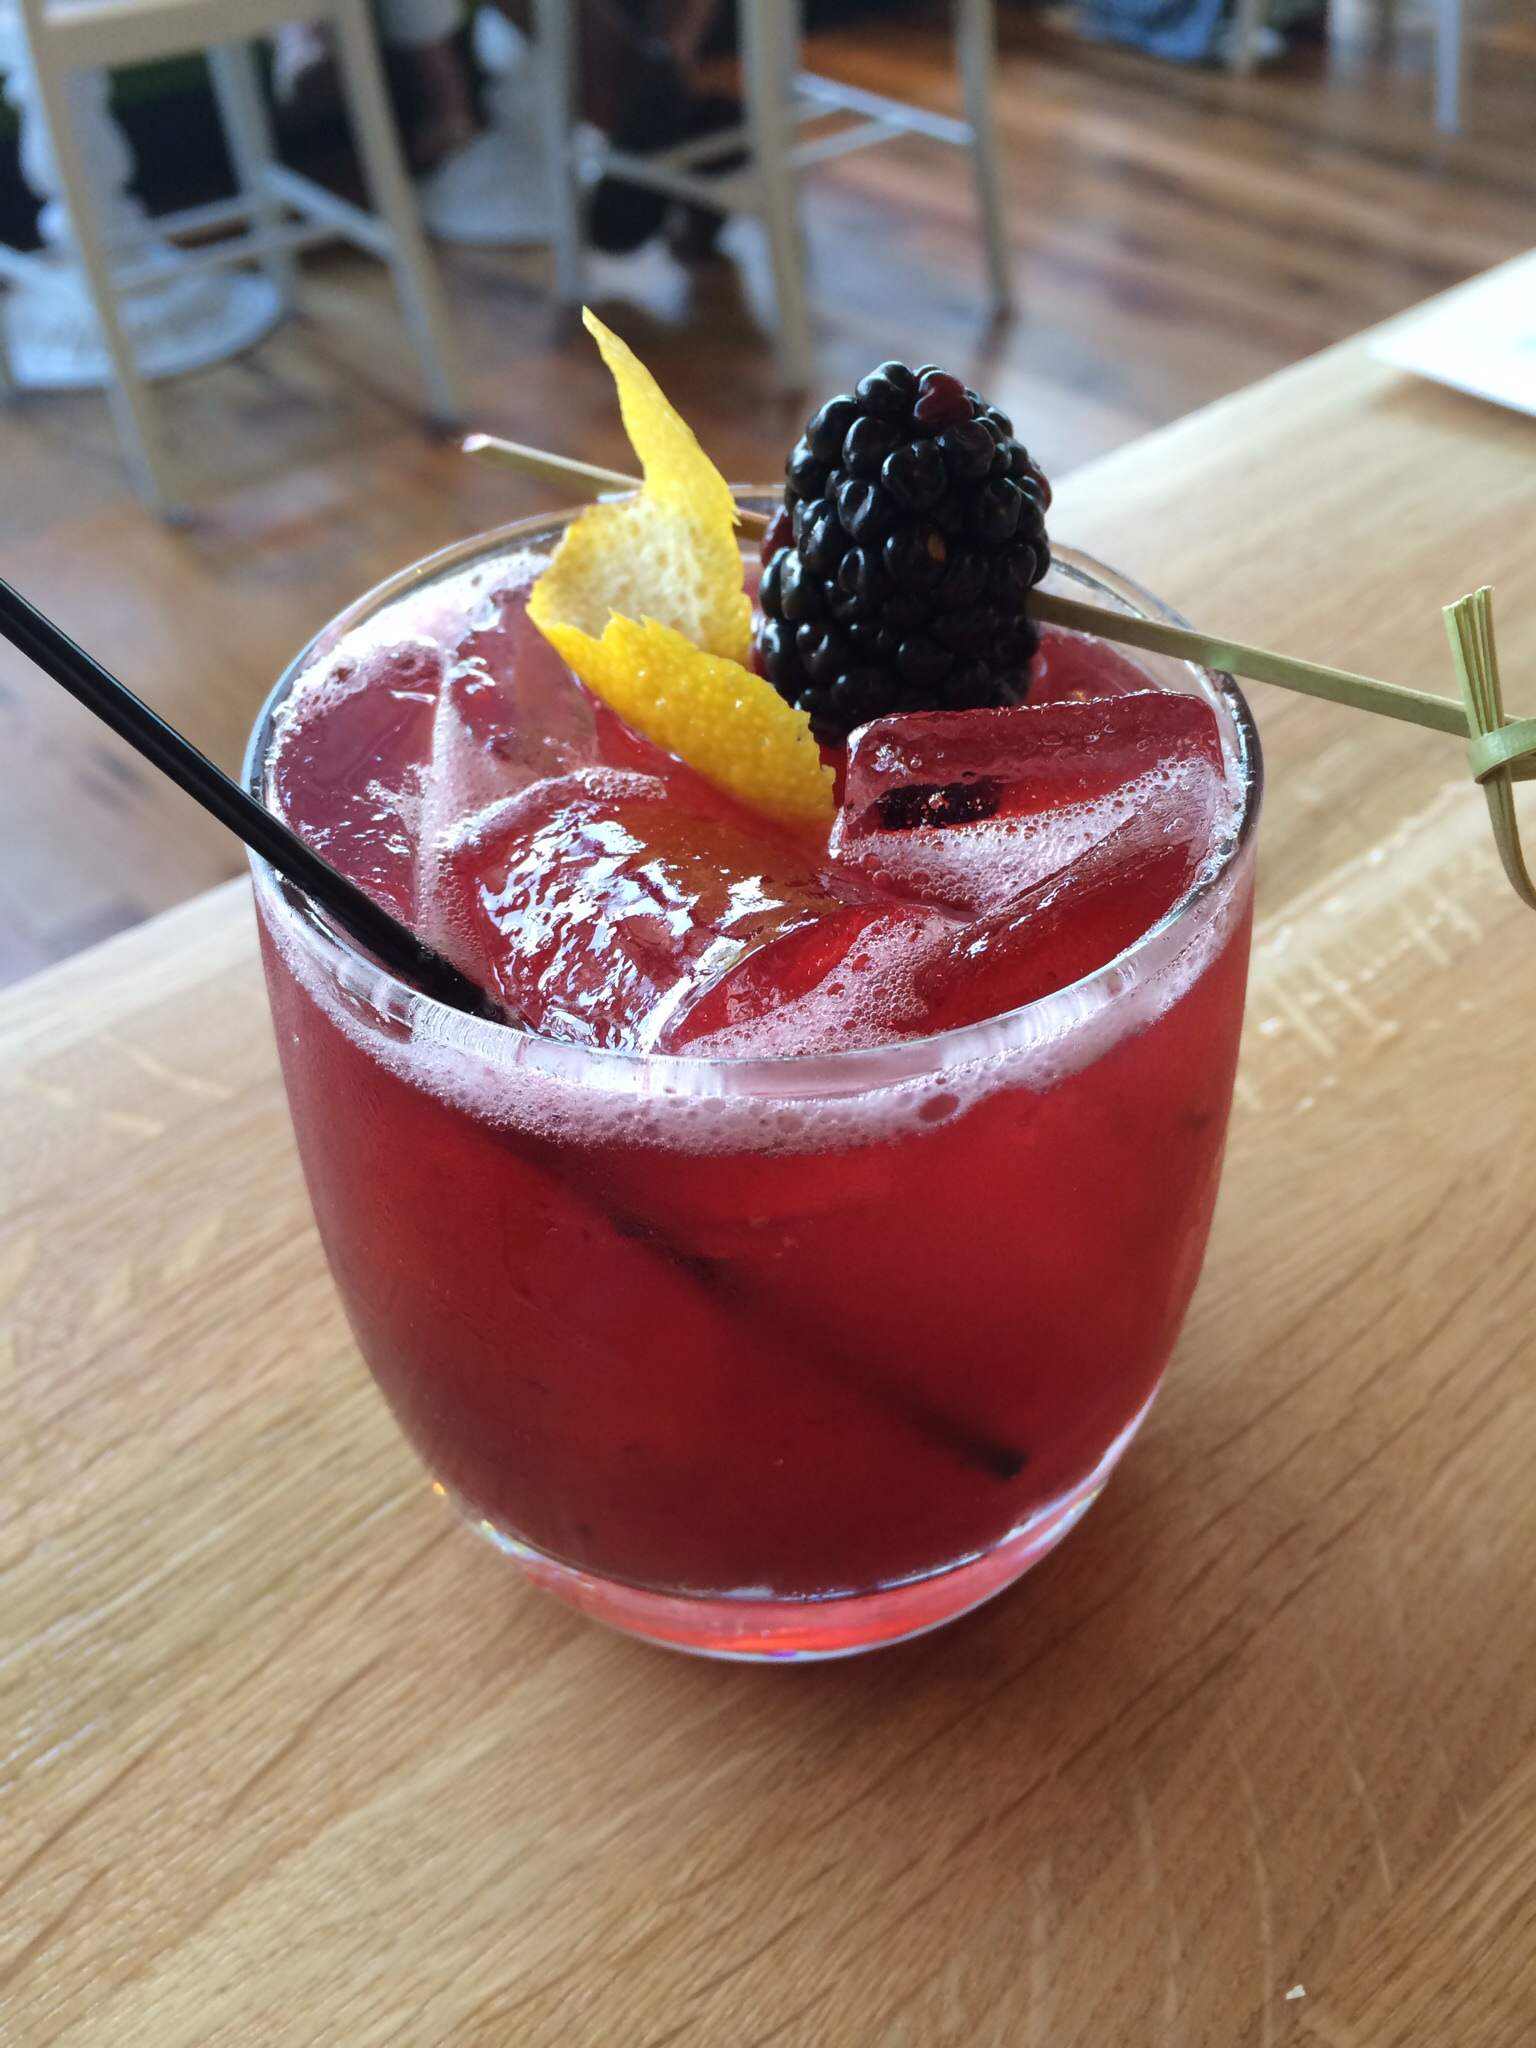 How to Make a Smoked Blackberry Bourbon Cobbler